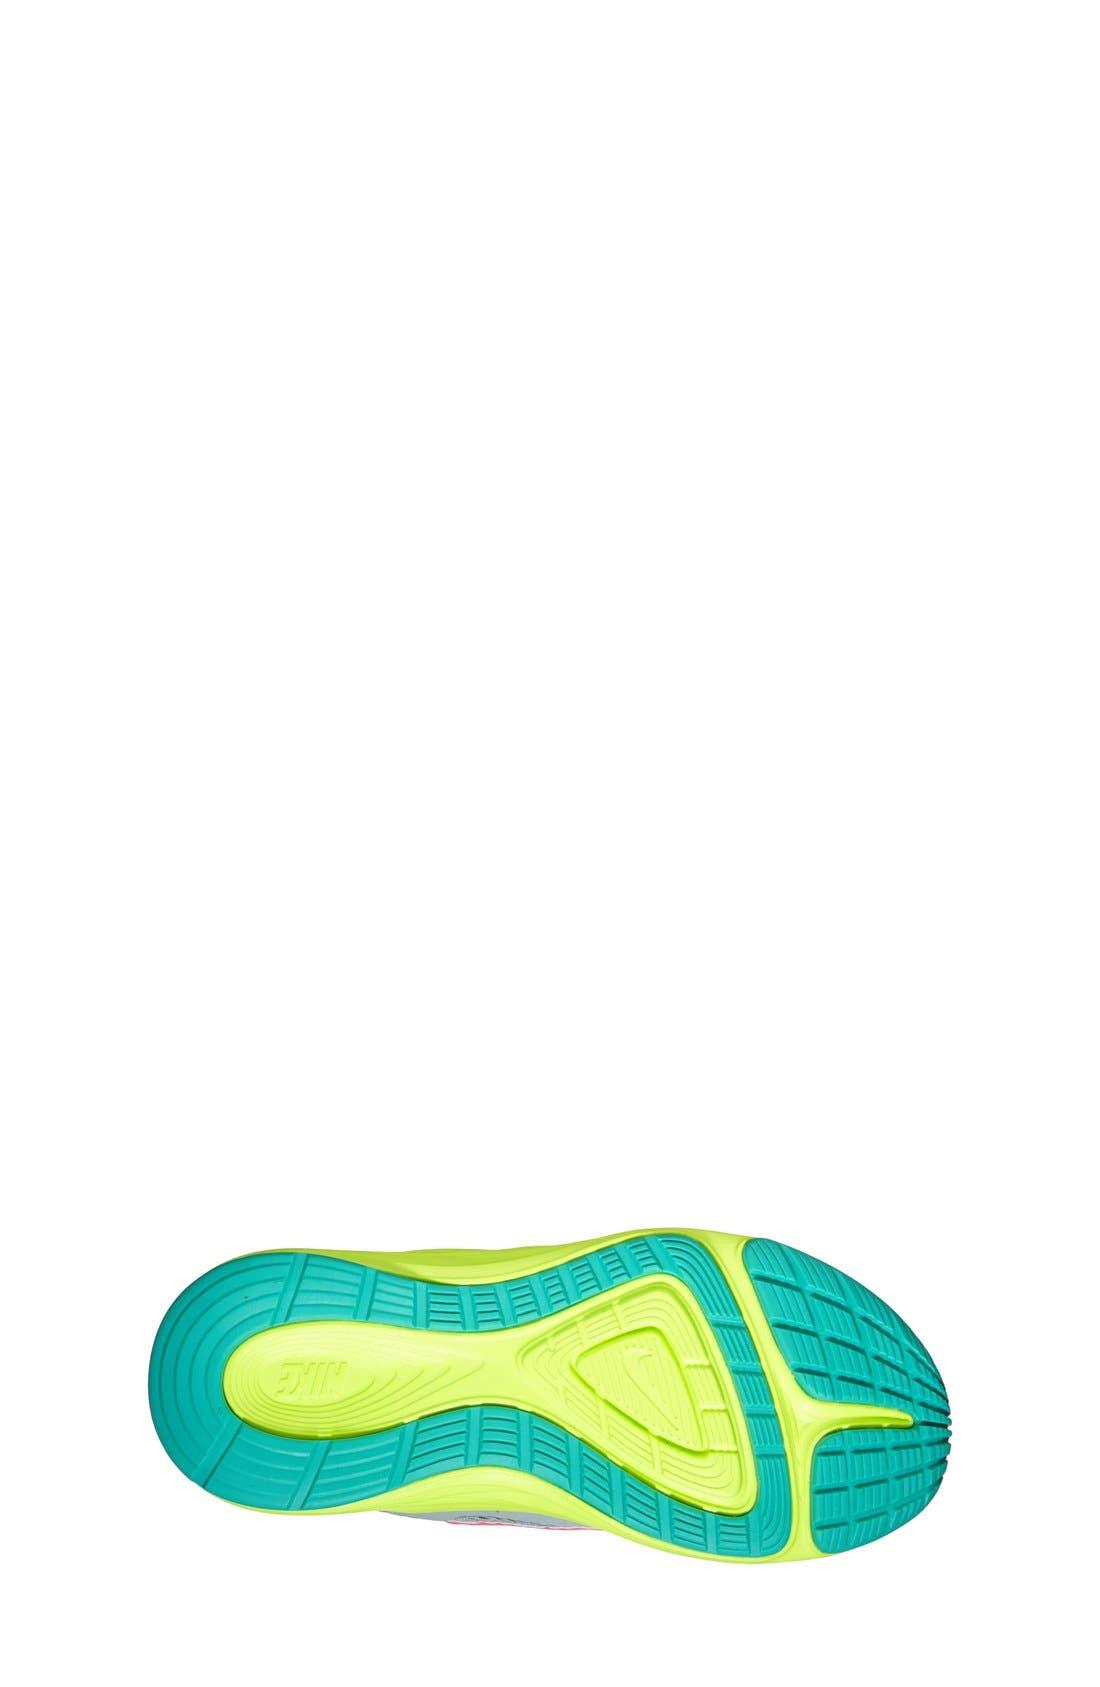 Alternate Image 4  - Nike 'Dual Fusion Run' Athletic Shoe (Toddler & Little Kid)